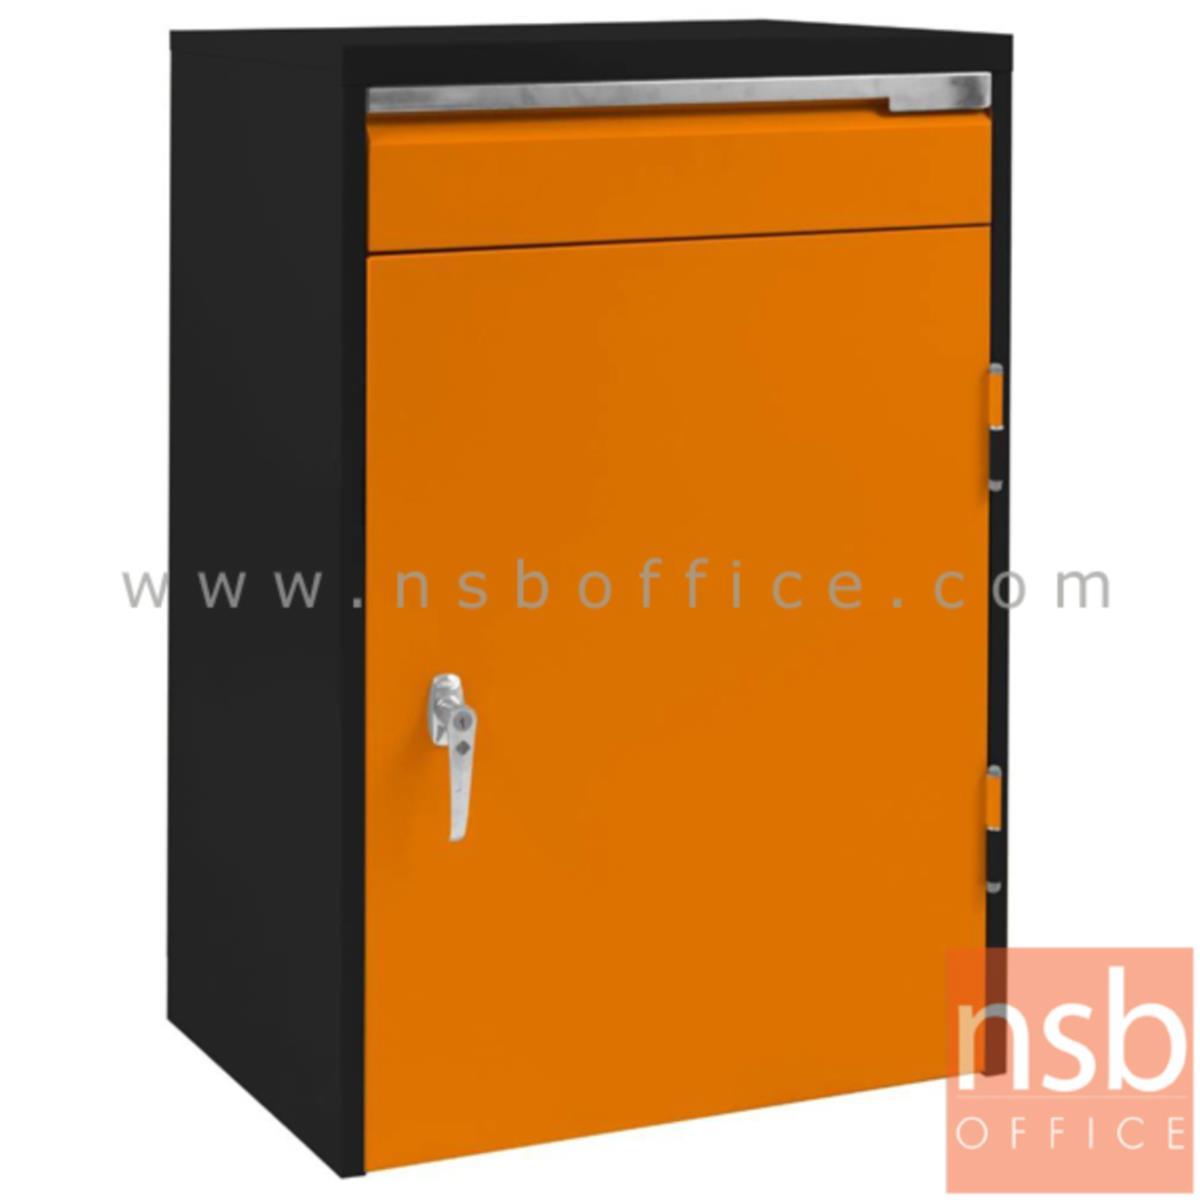 E08A070:ตู้เก็บเครื่องมือช่าง 1 ลิ้นชัก 1 บานเปิด 61.6W*45.7D*90H cm. รุ่น MGC36